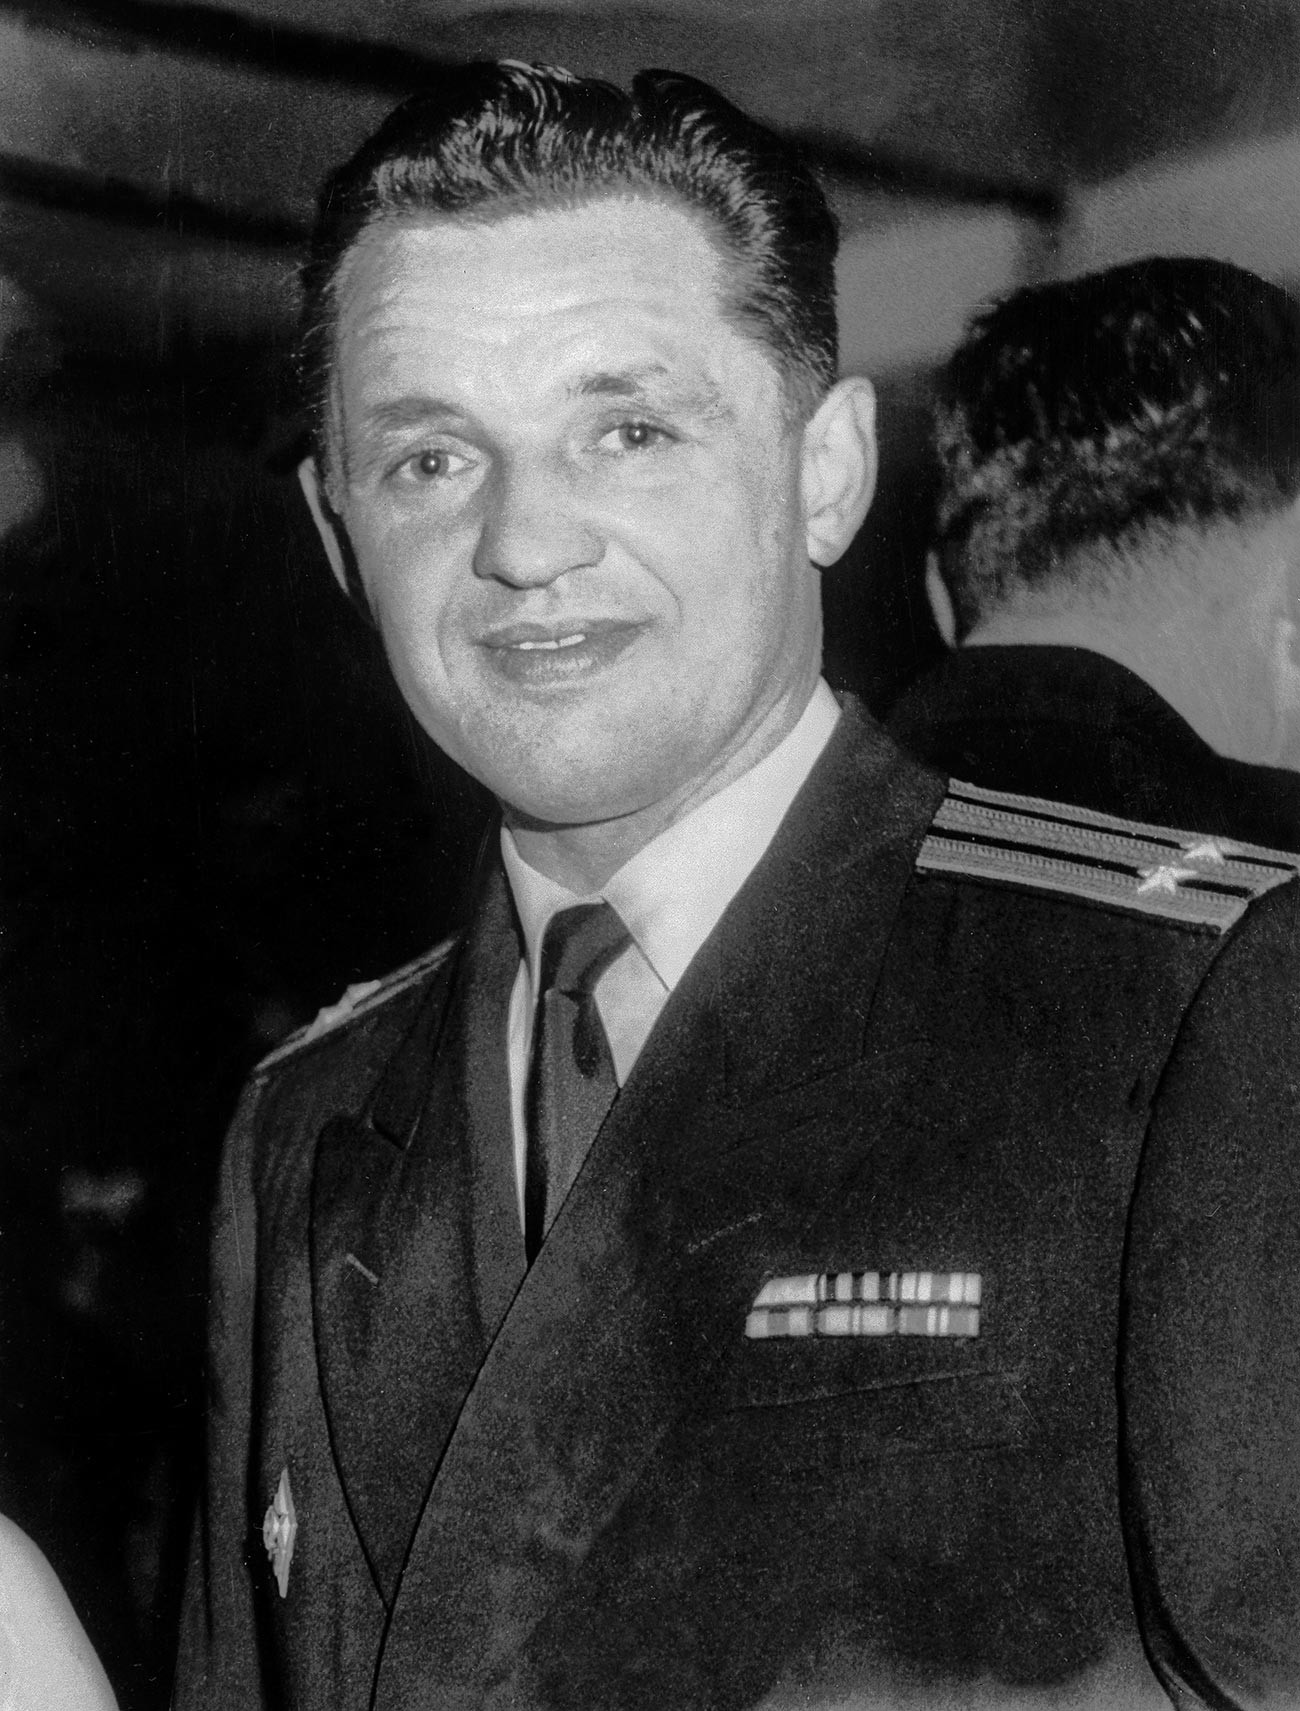 Eugen Iwanow